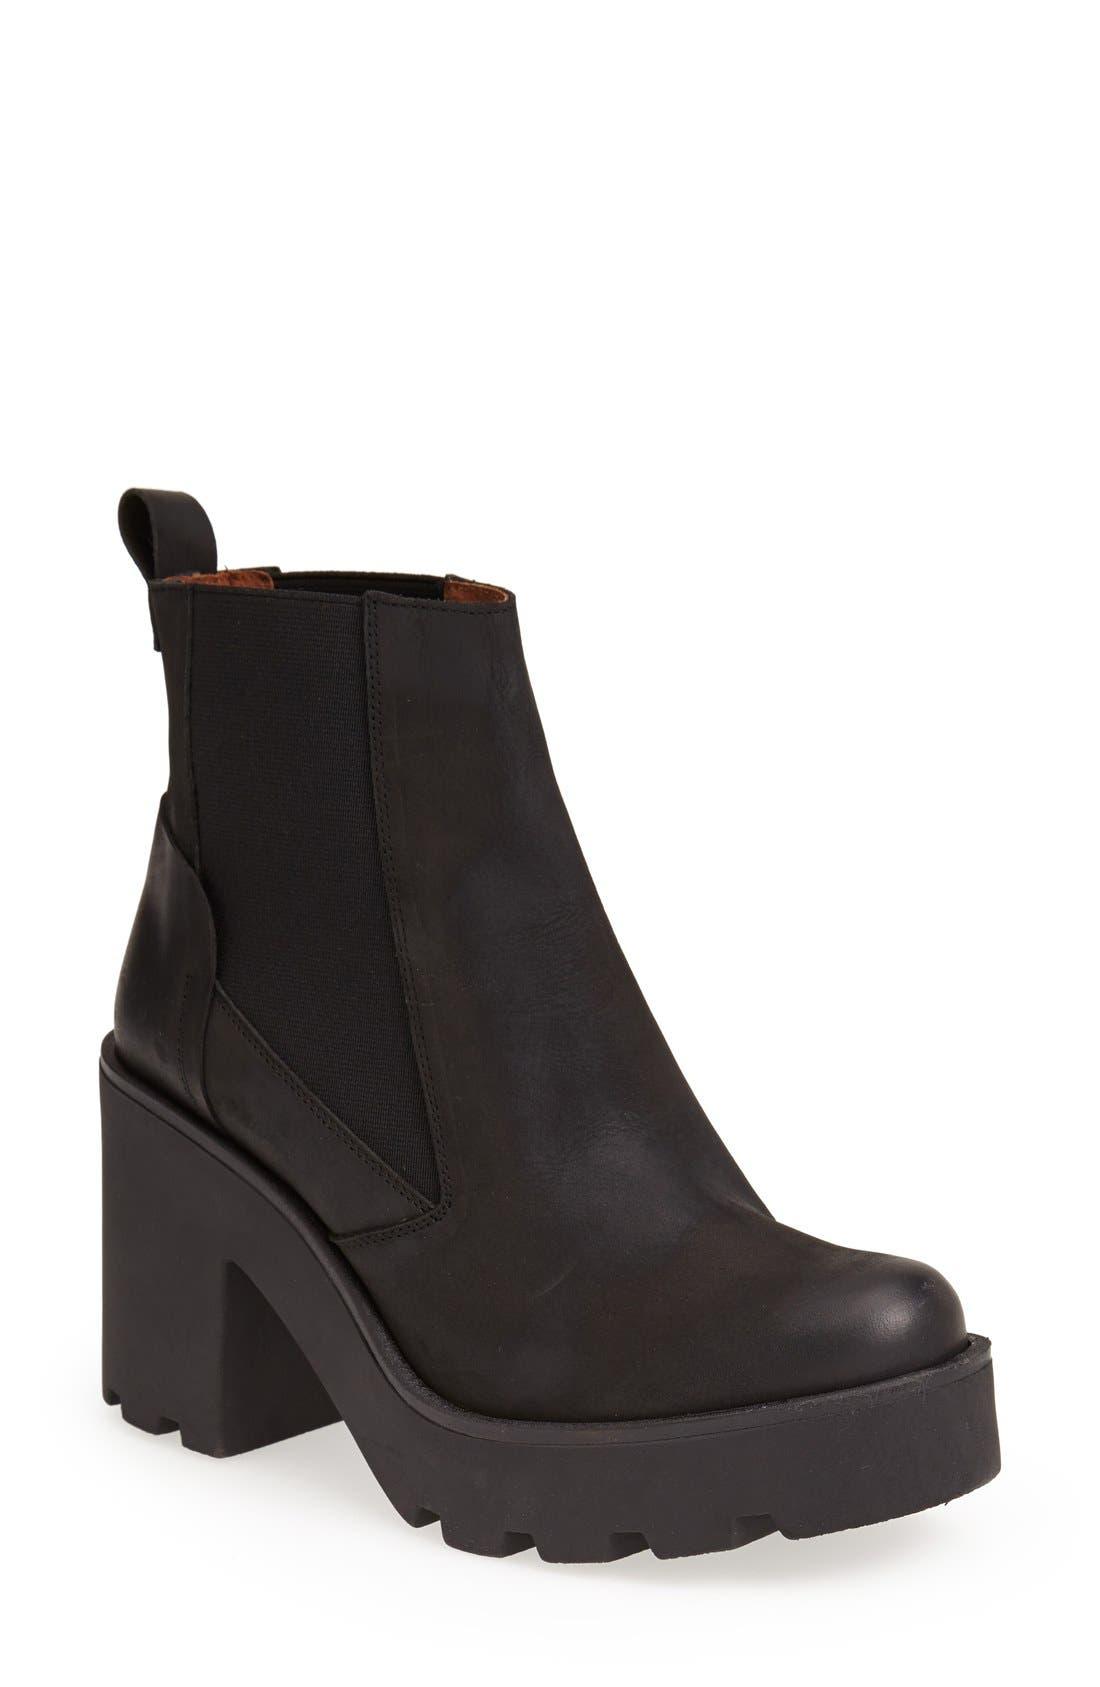 Main Image - SIXTYSEVEN 'Allie' Slip-On Boot (Women)